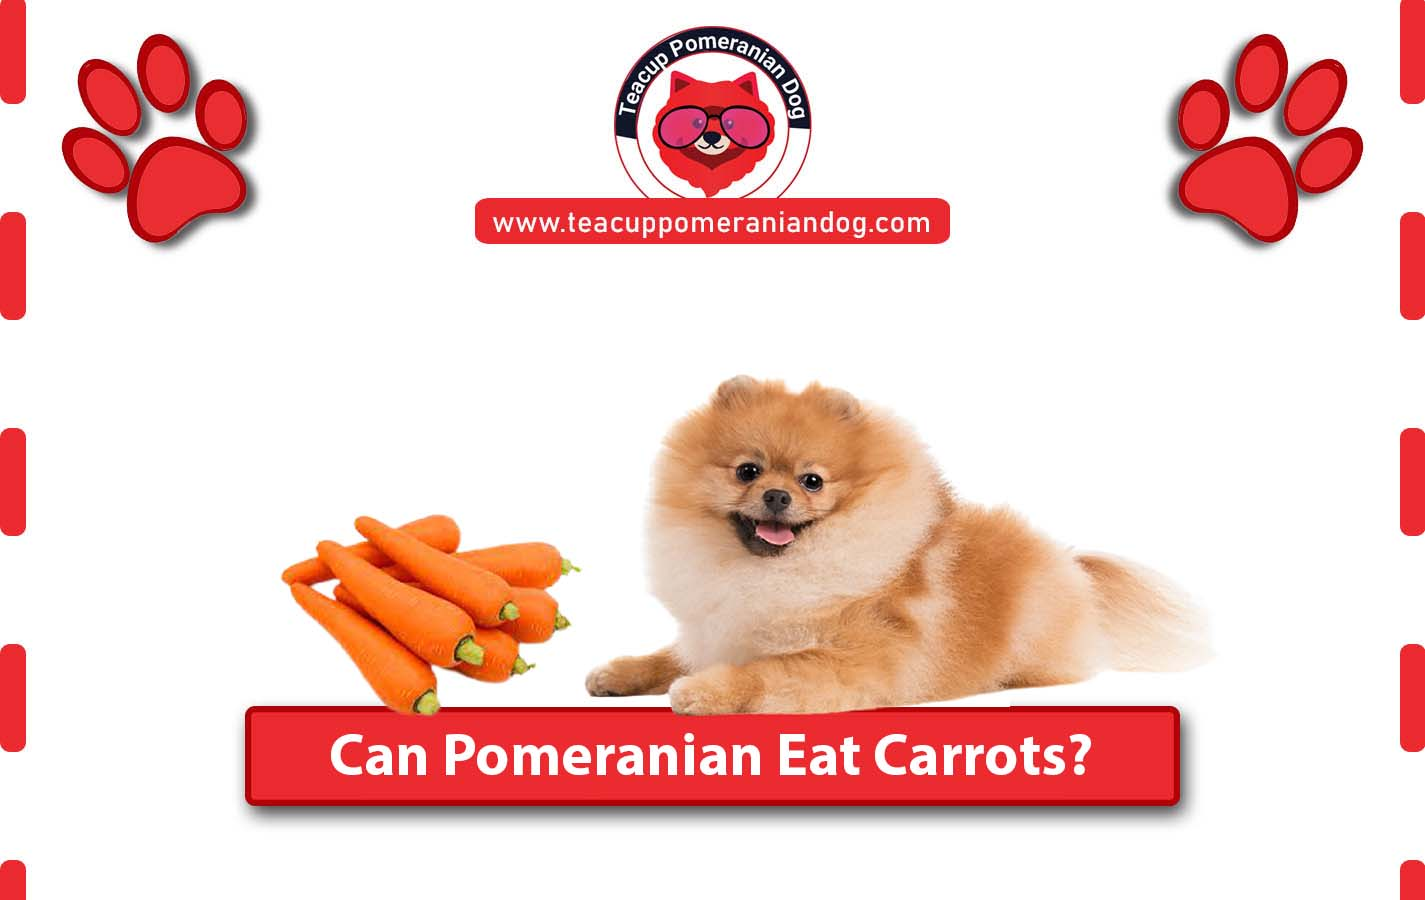 Can Pomeranian eat Carrots